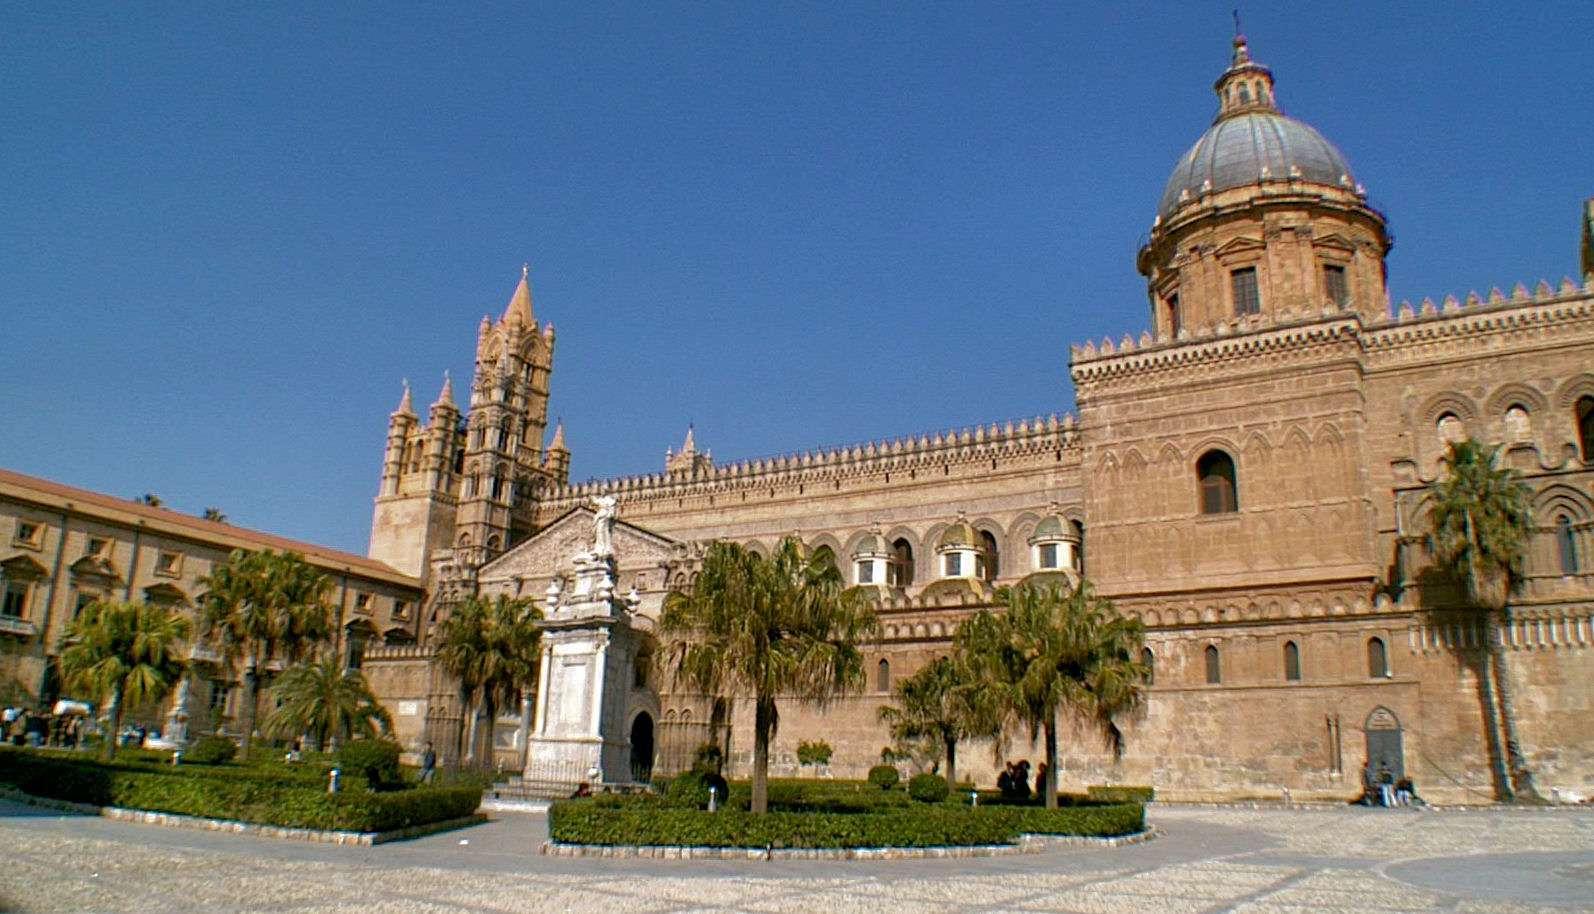 Domkriken i Palermo